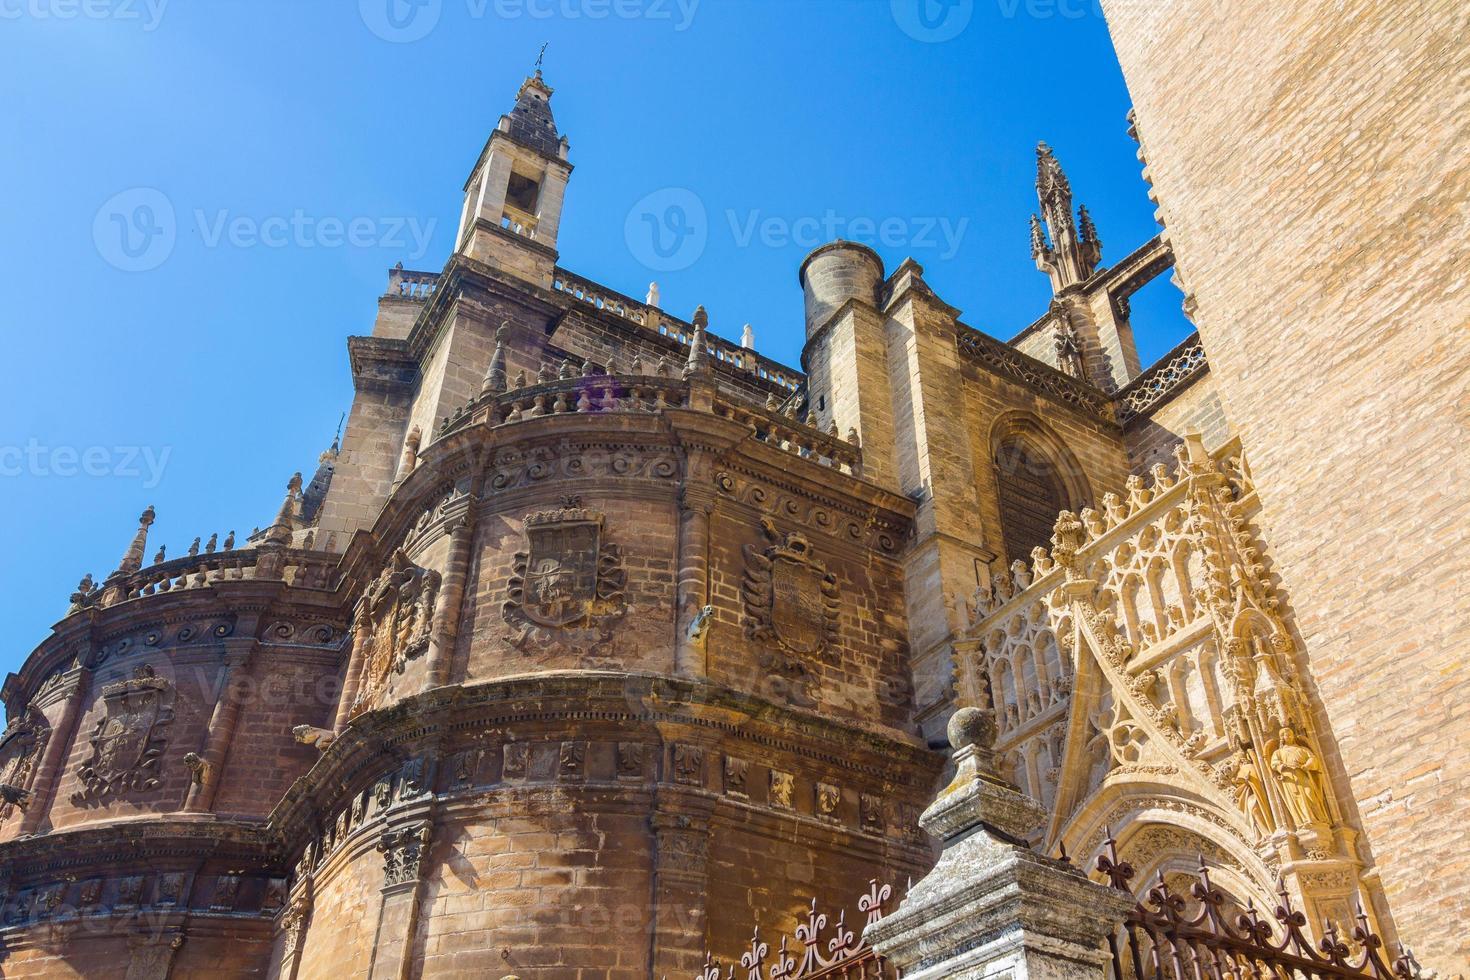 detaljer om fasaden katedralen santa maria la giralda foto